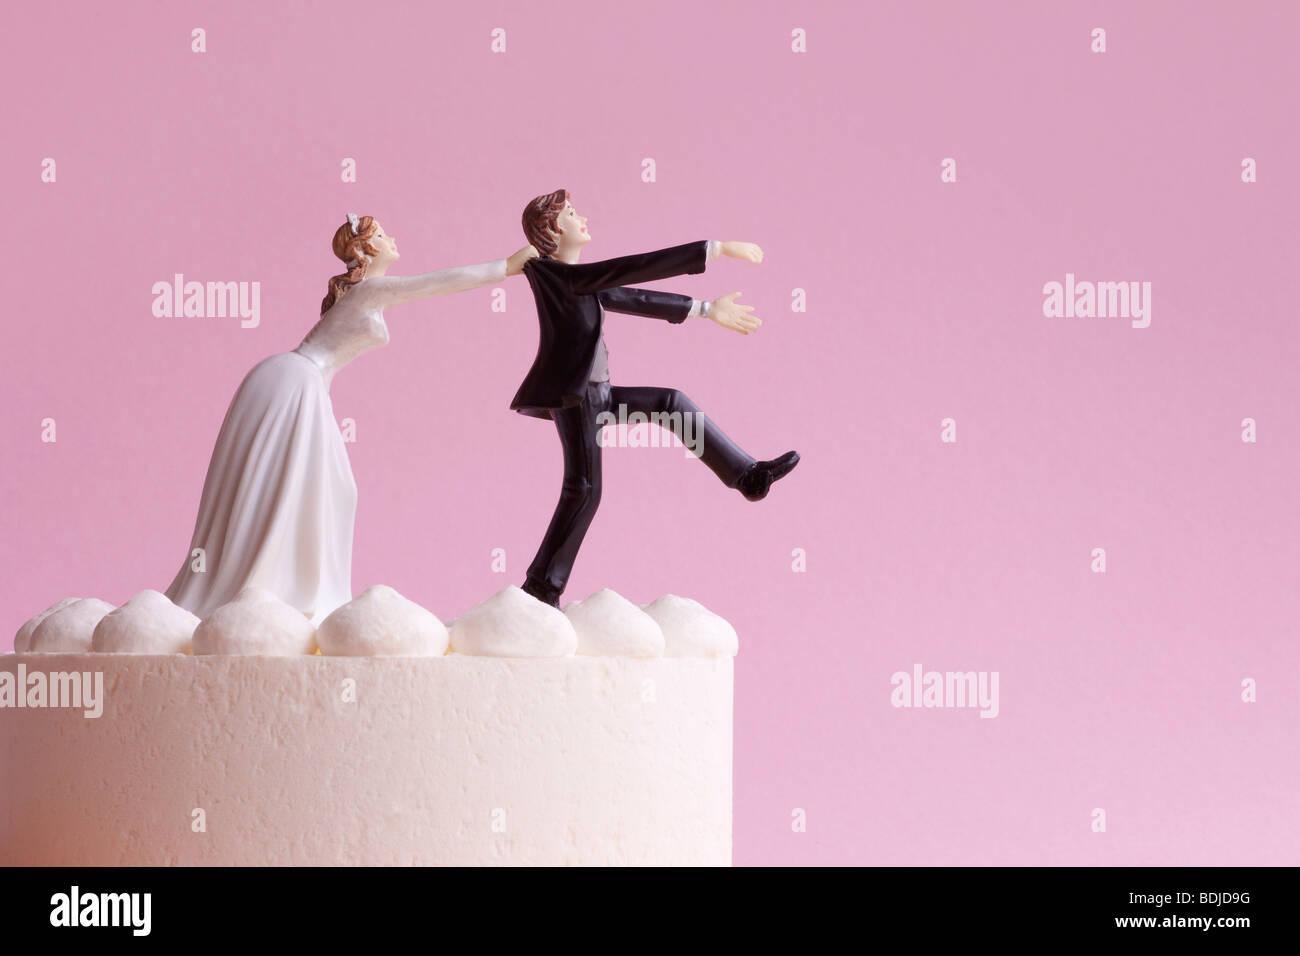 Wedding Cake Figurines, Bride Grabbing Runaway Groom Stock Photo